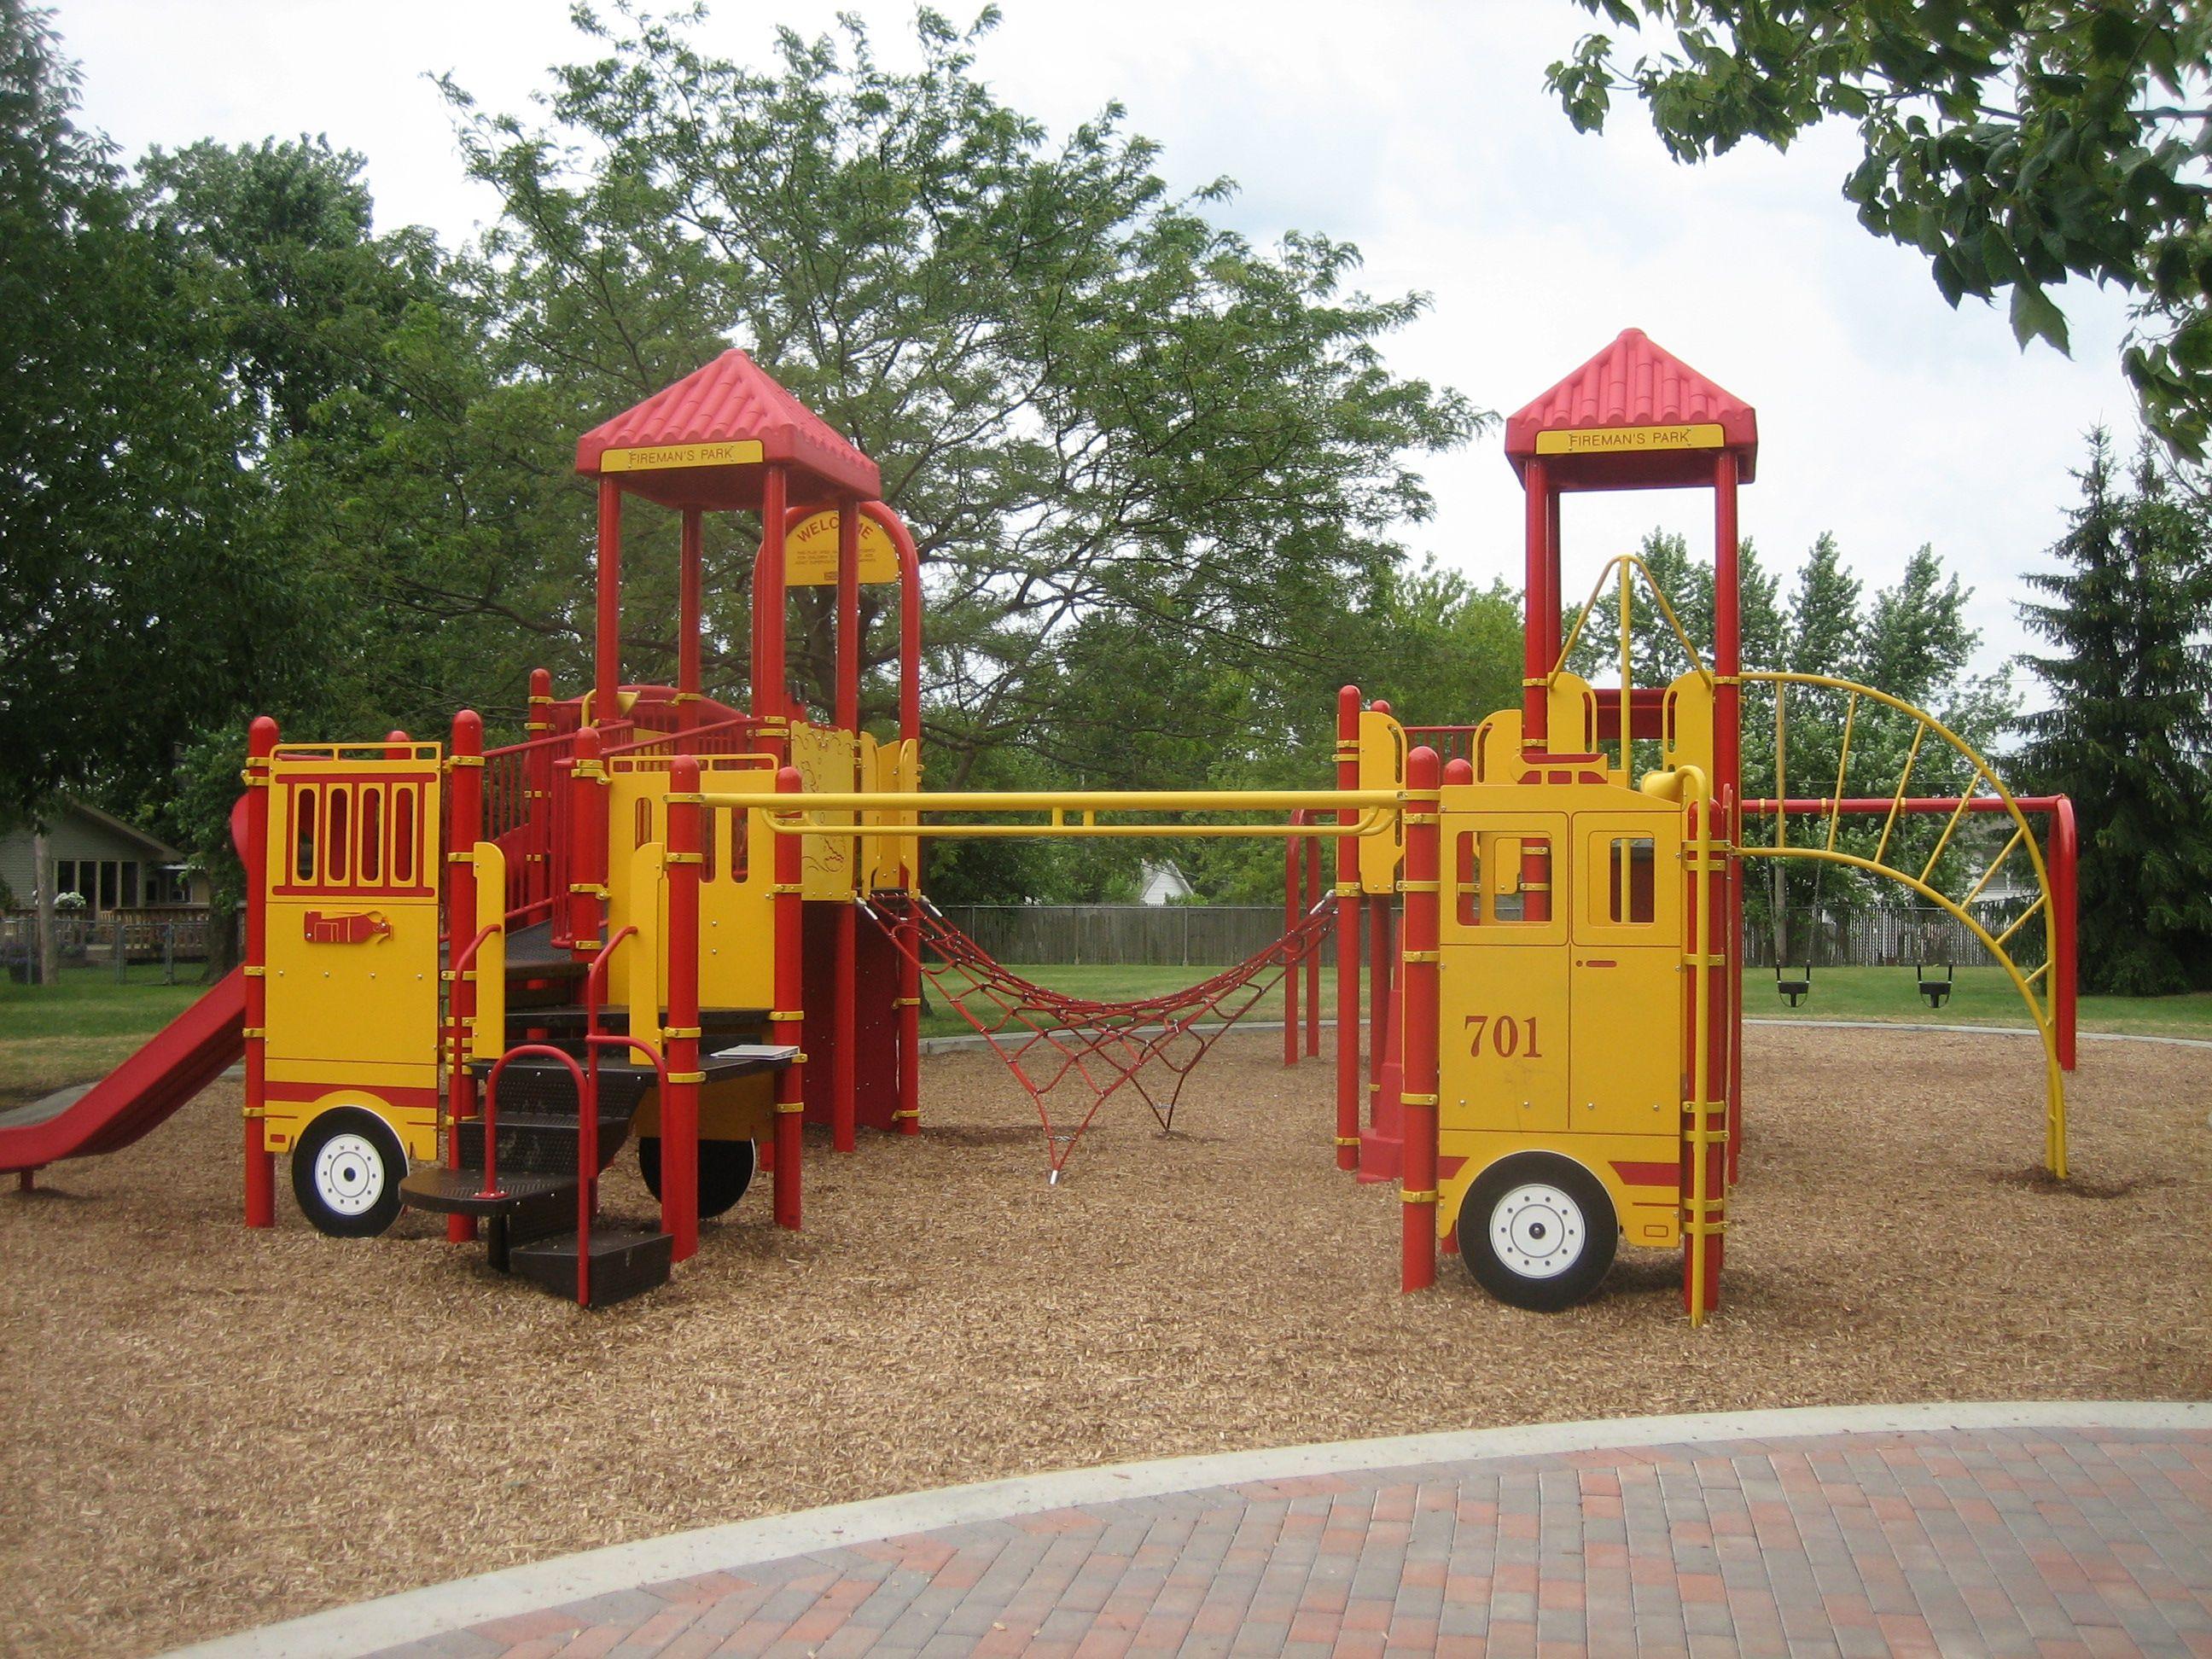 Firetruck Theme Playground at Fireman s Park Waukegan IL